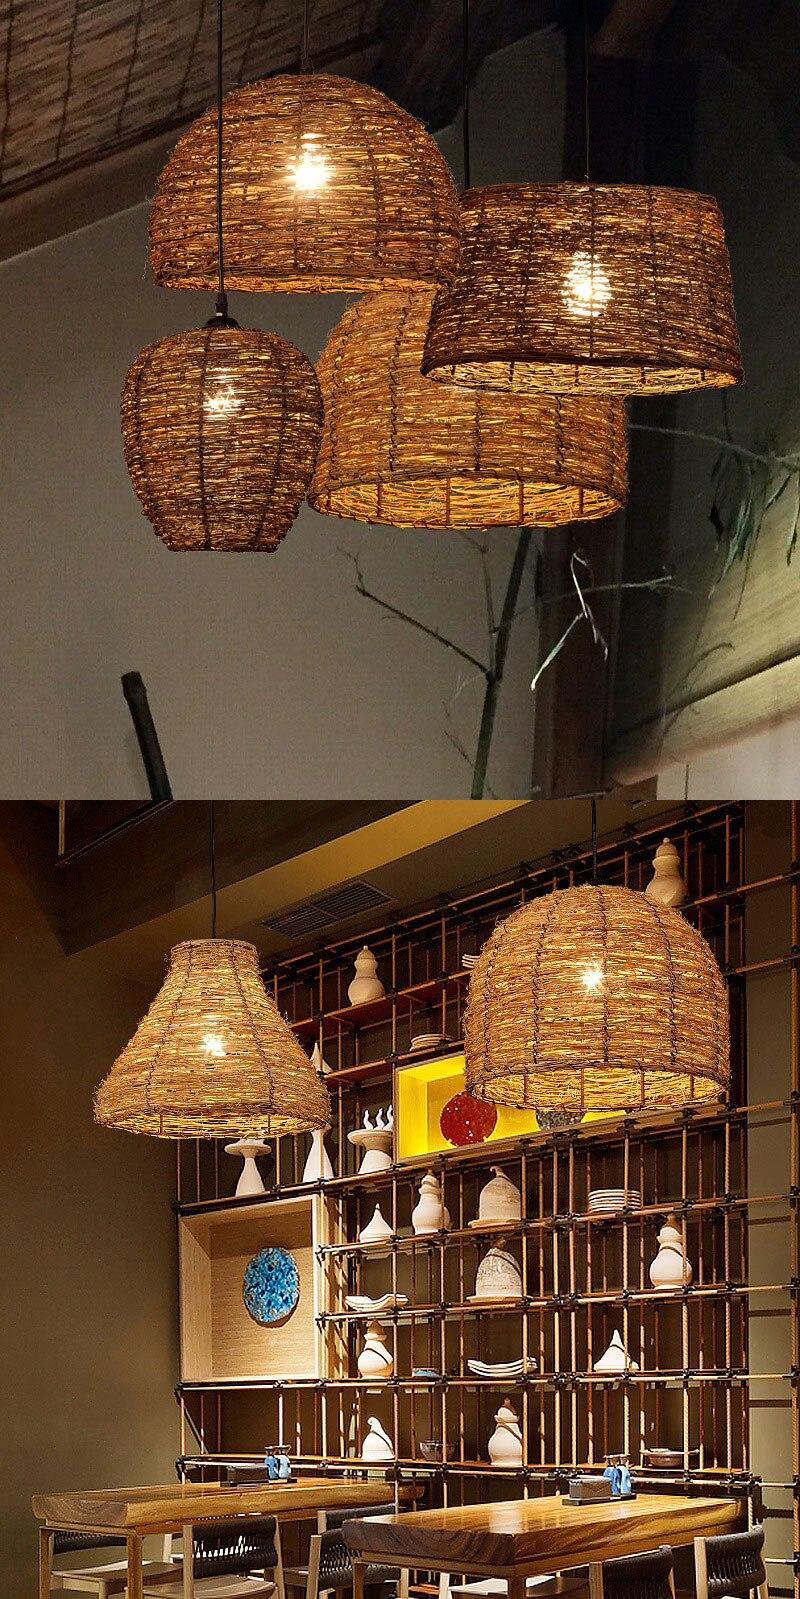 New Rattan Lamp Pendant Light Vintage Hanging Lamp LED For Living Room Dining Room Home Decor Cafe Restaurant Hanglamp